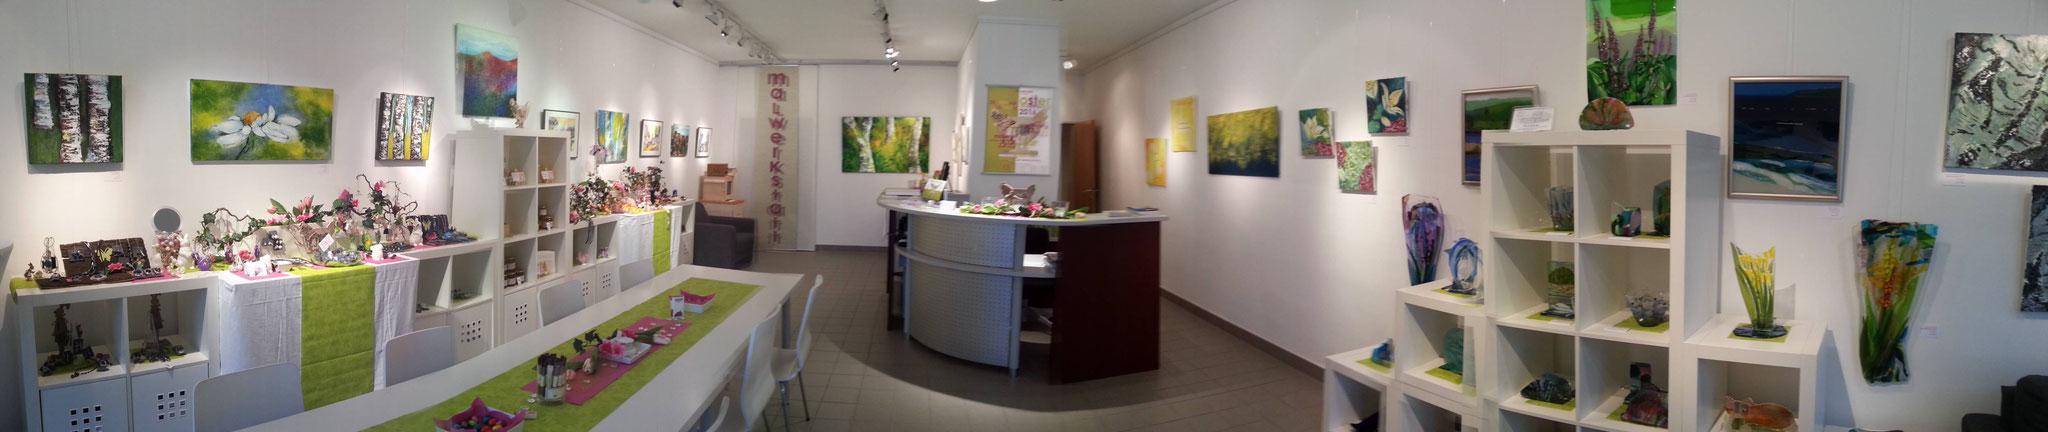 Ausstellungs-Eröffnung: Sonntag, 28. Februar 2016